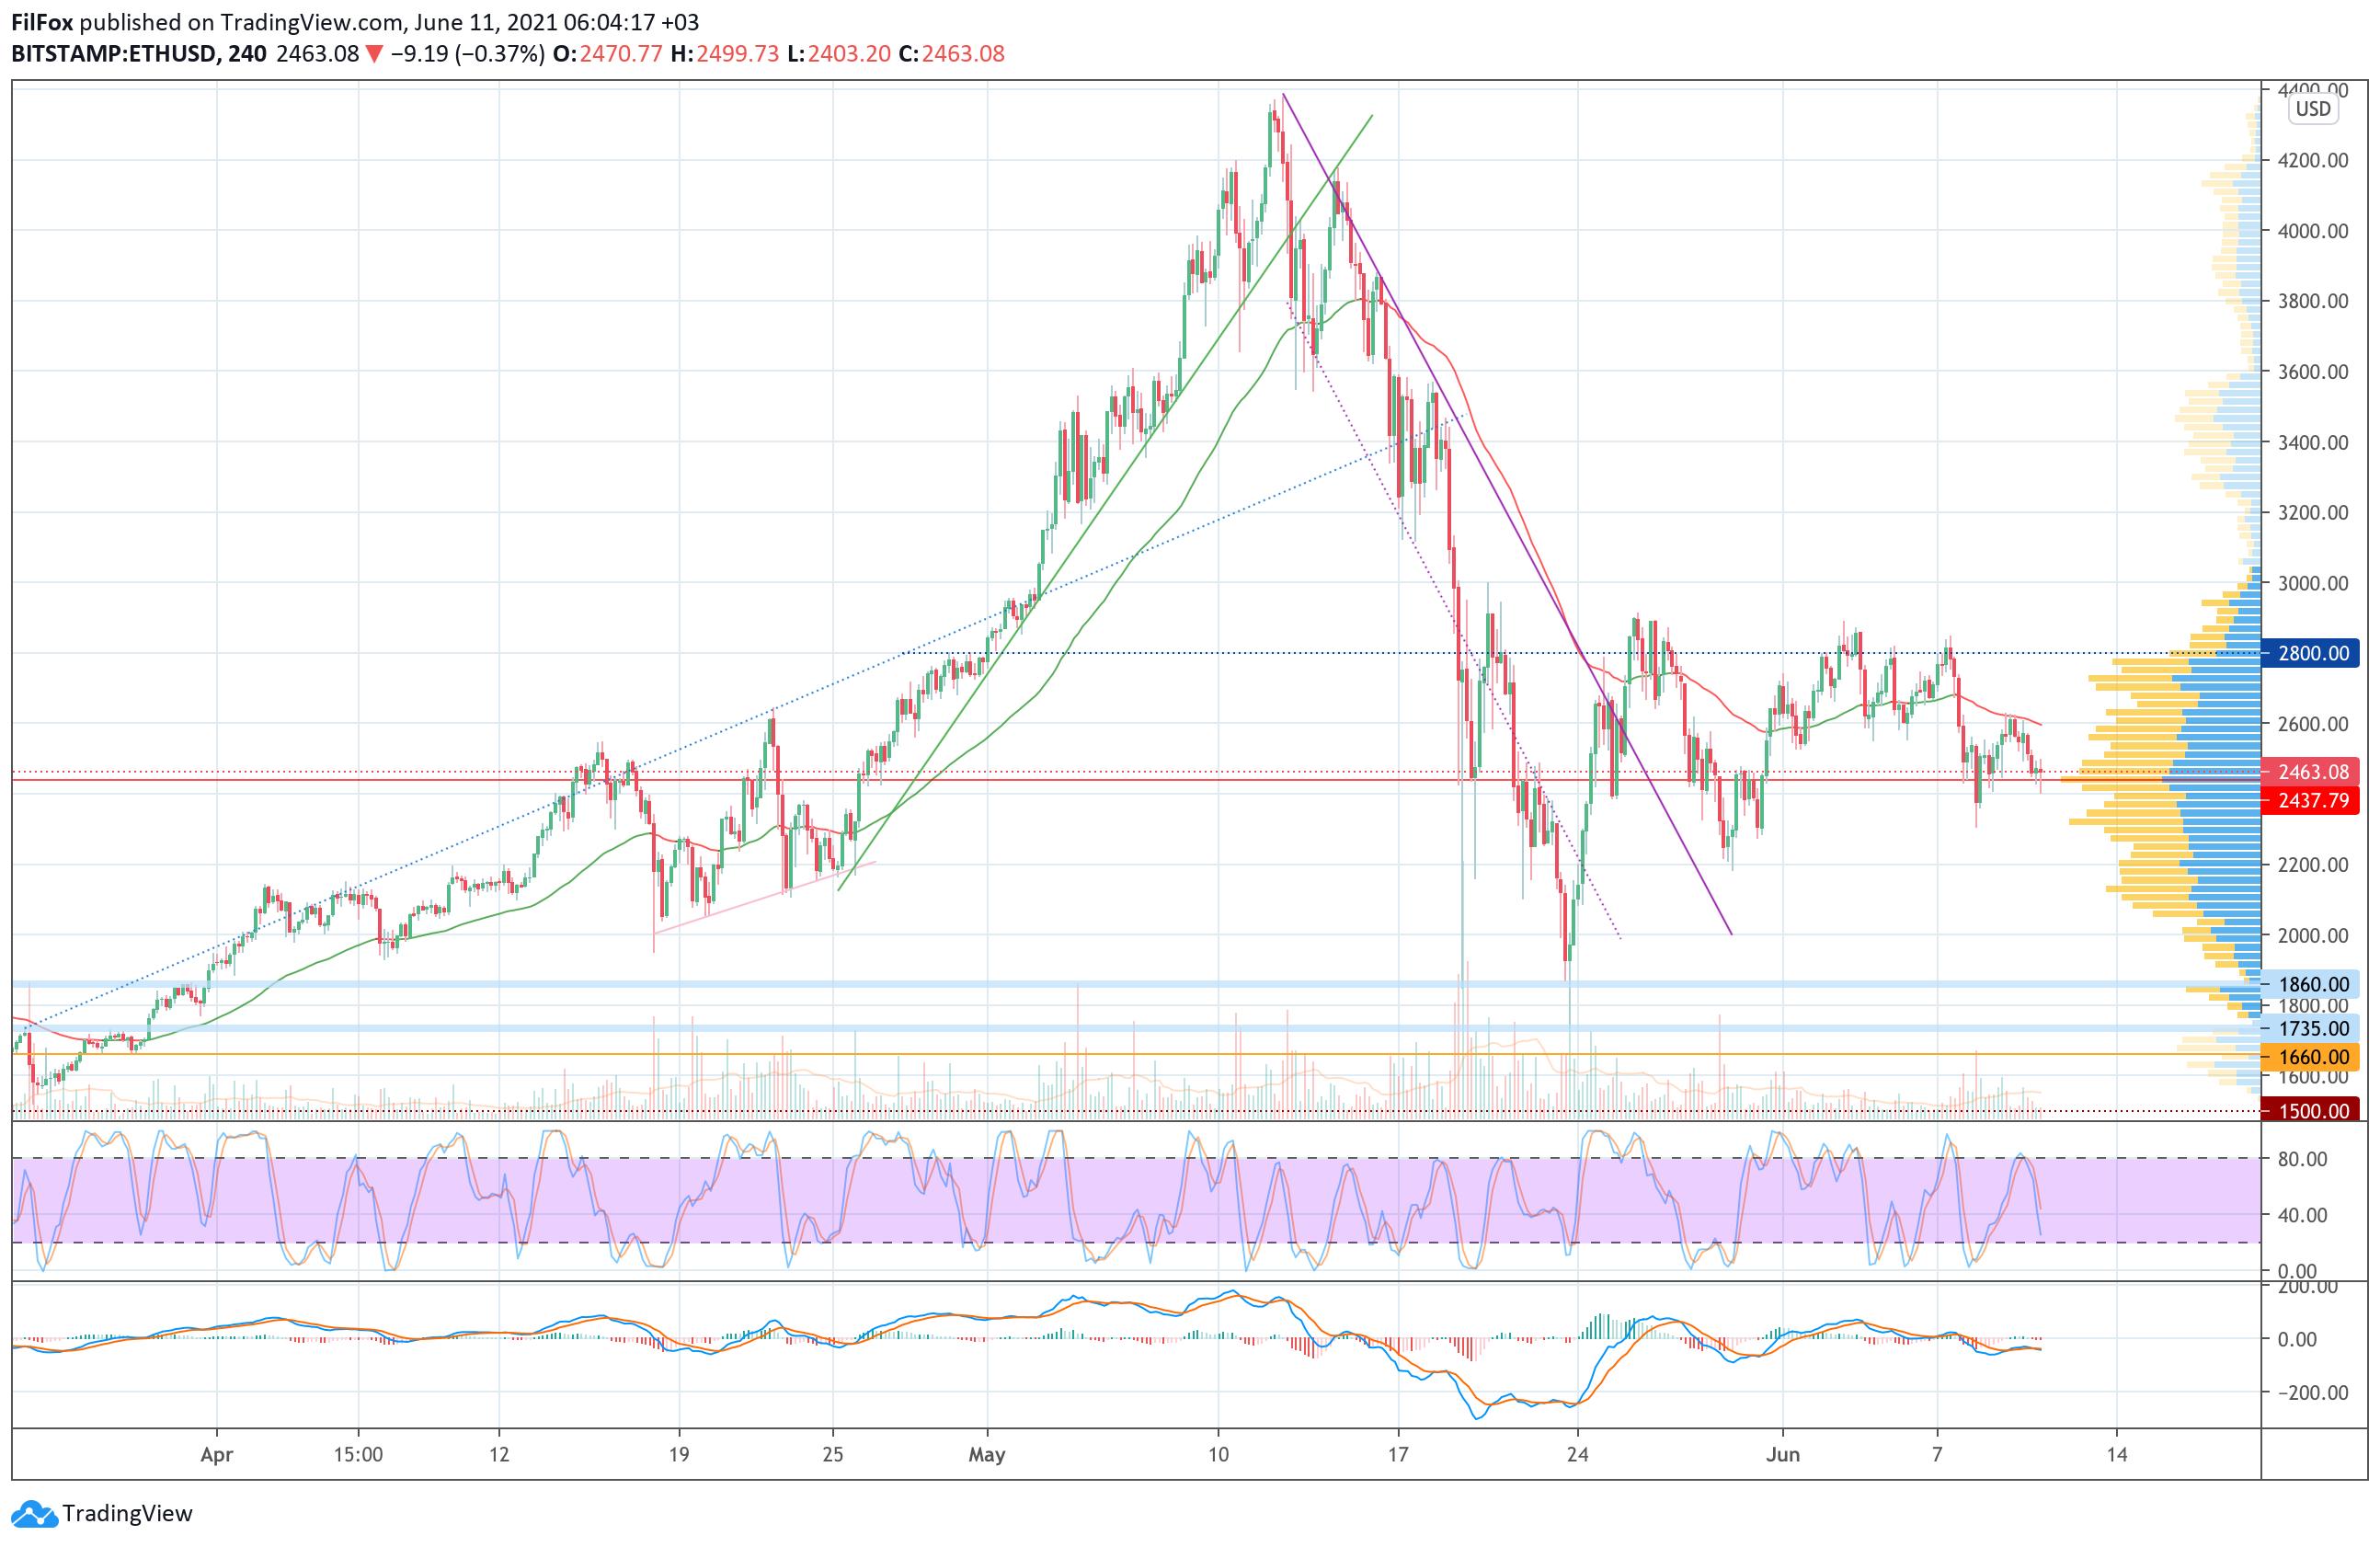 Анализ цен Bitcoin, Ethereum, XRP на 11.06.2021